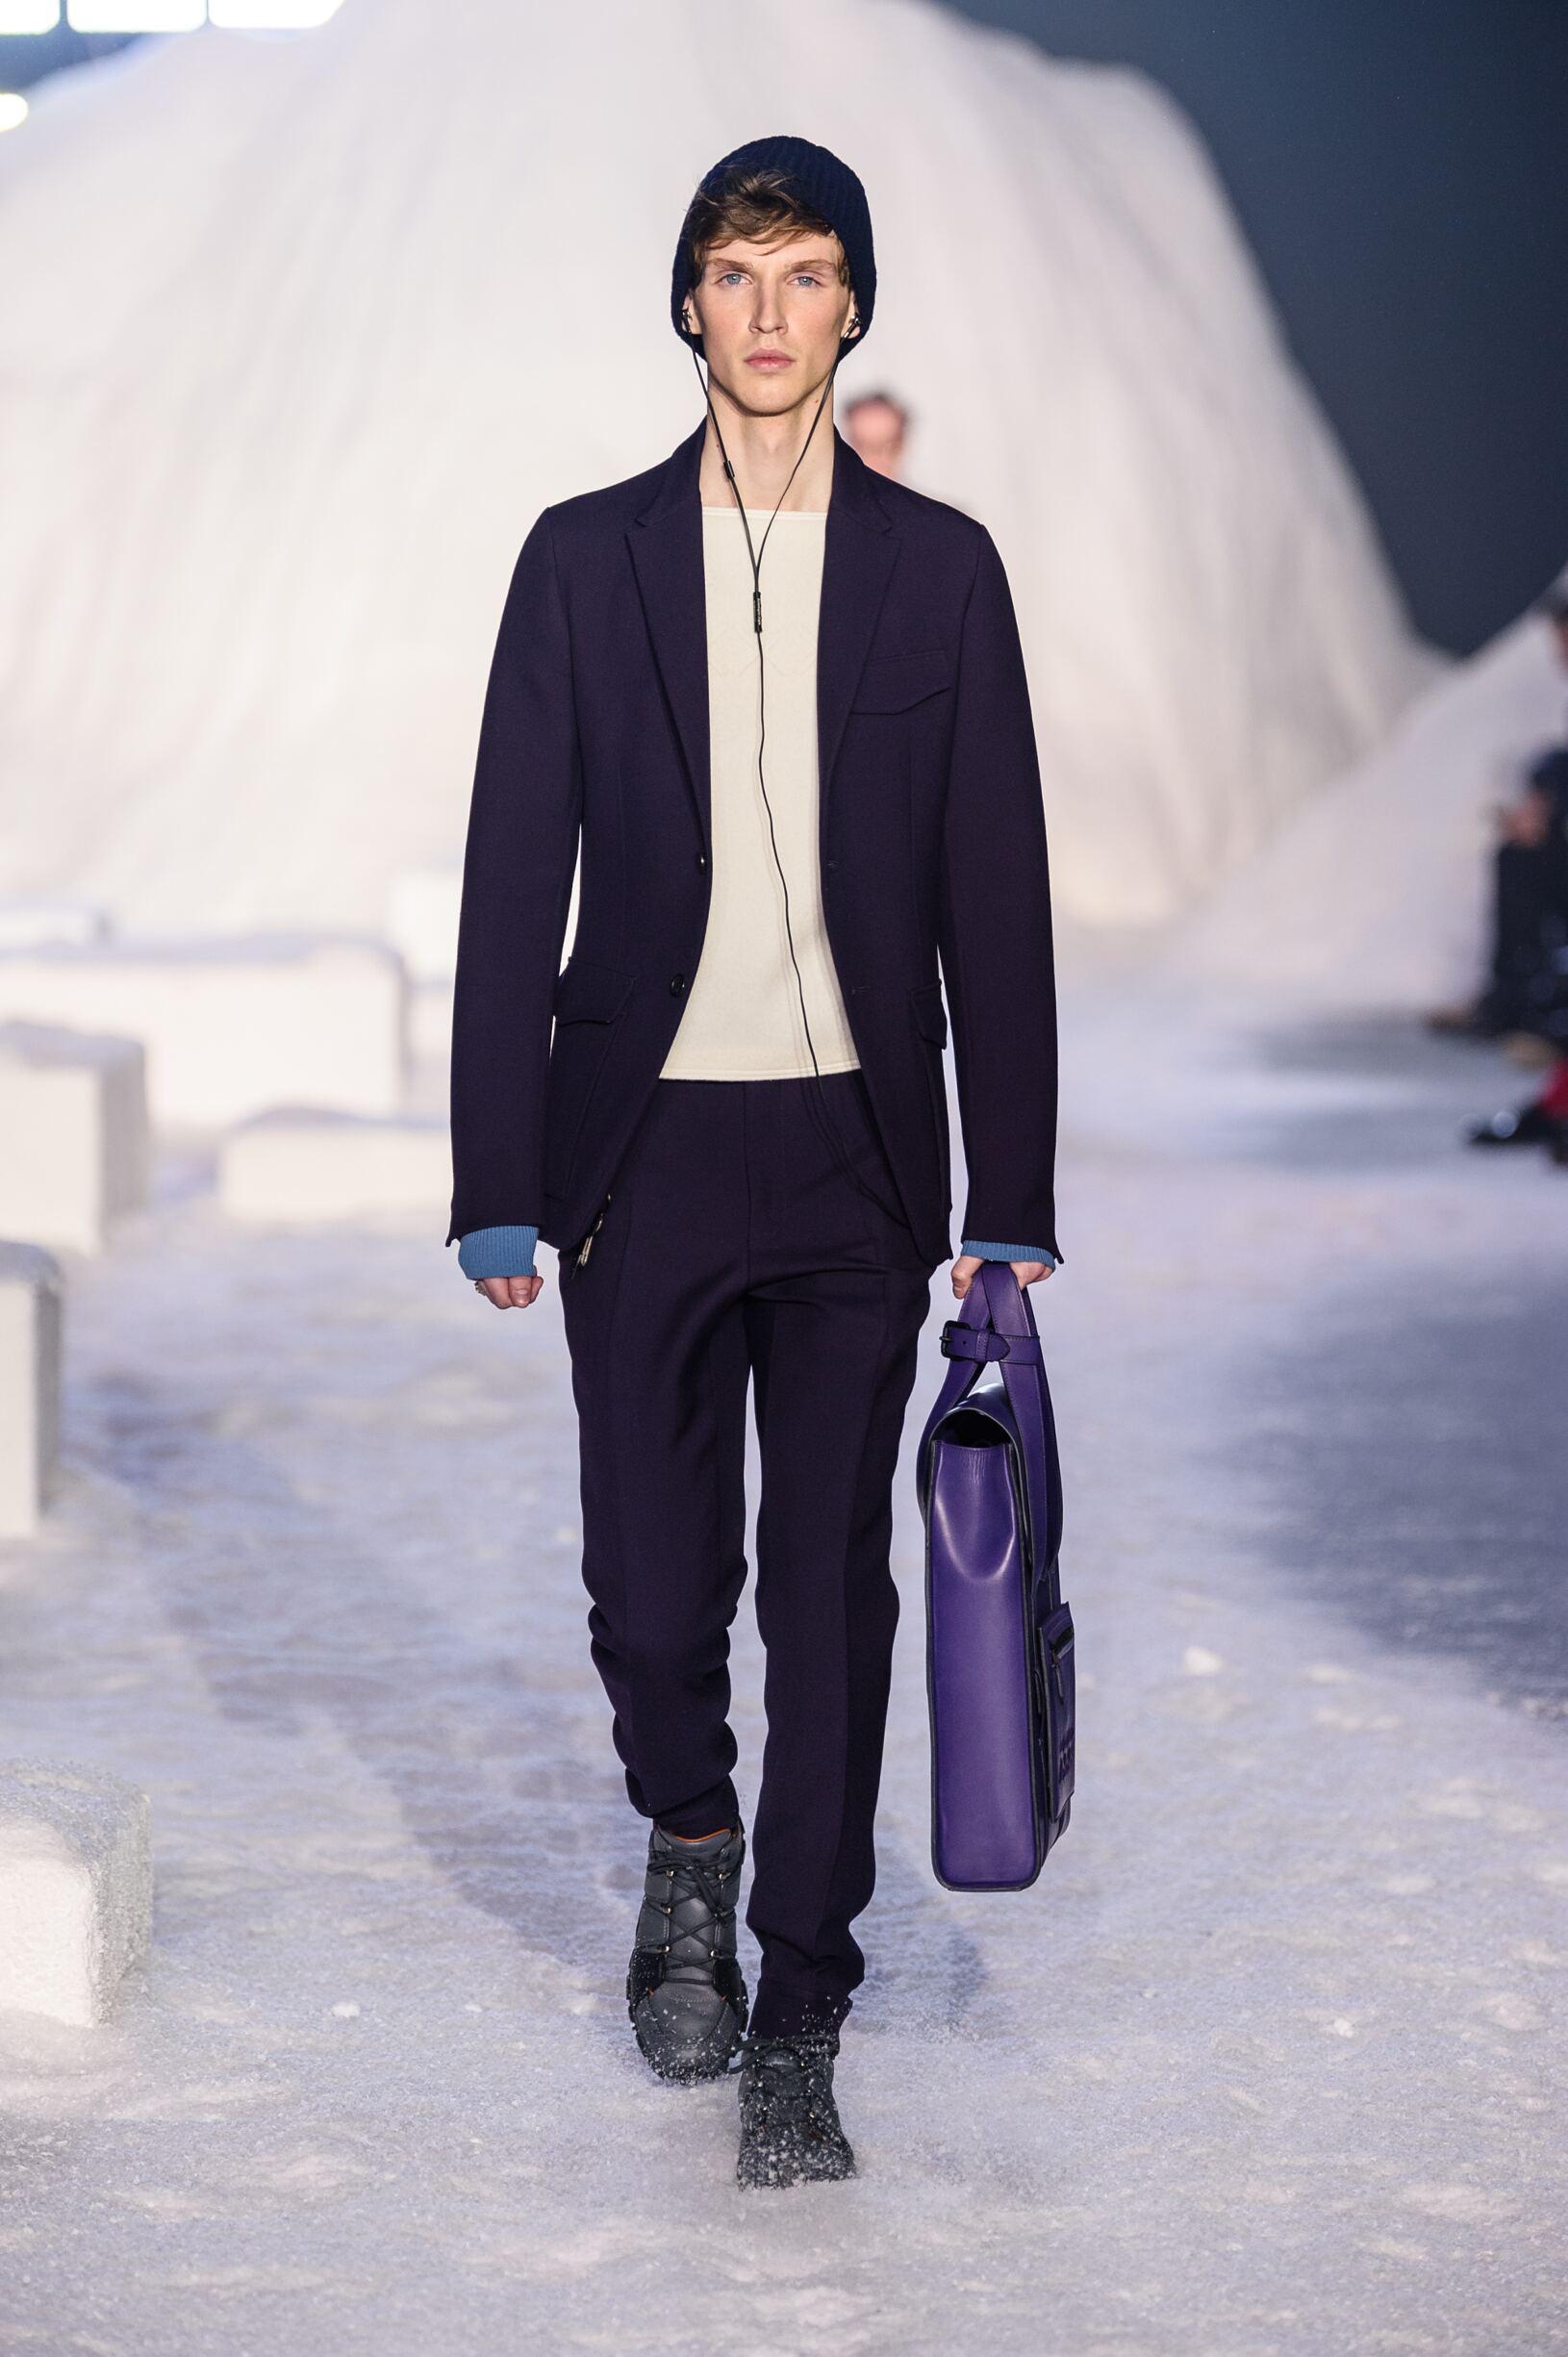 2018 Catwalk Ermenegildo Zegna Couture Man Fashion Show Winter